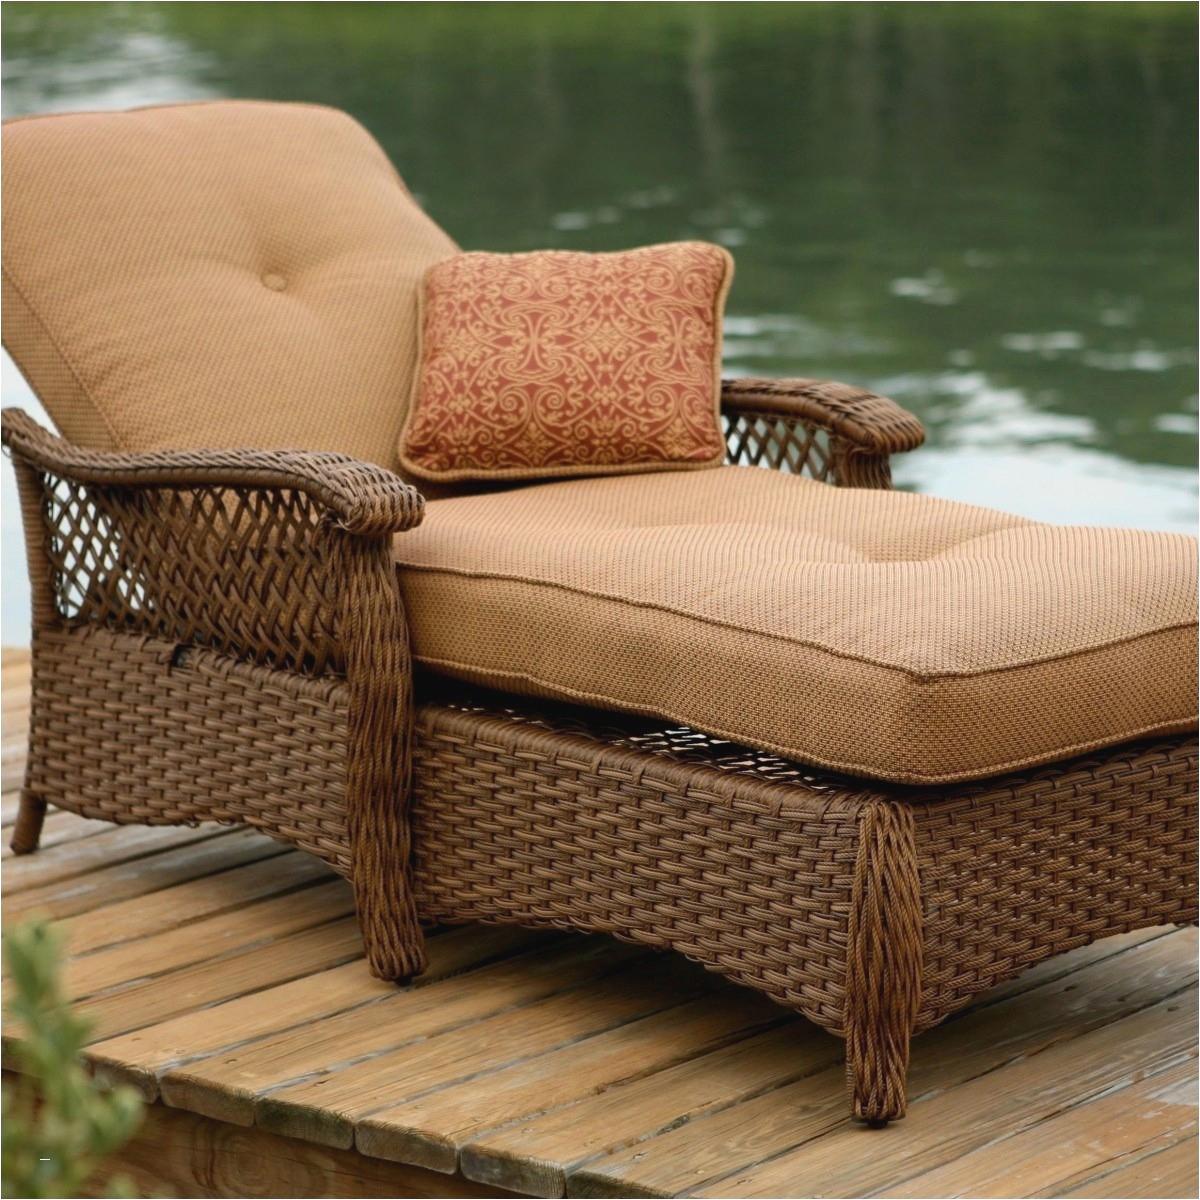 outdoor furniture cushions luxury patio furniture cushions walmart nice wicker outdoor sofa 0d patio